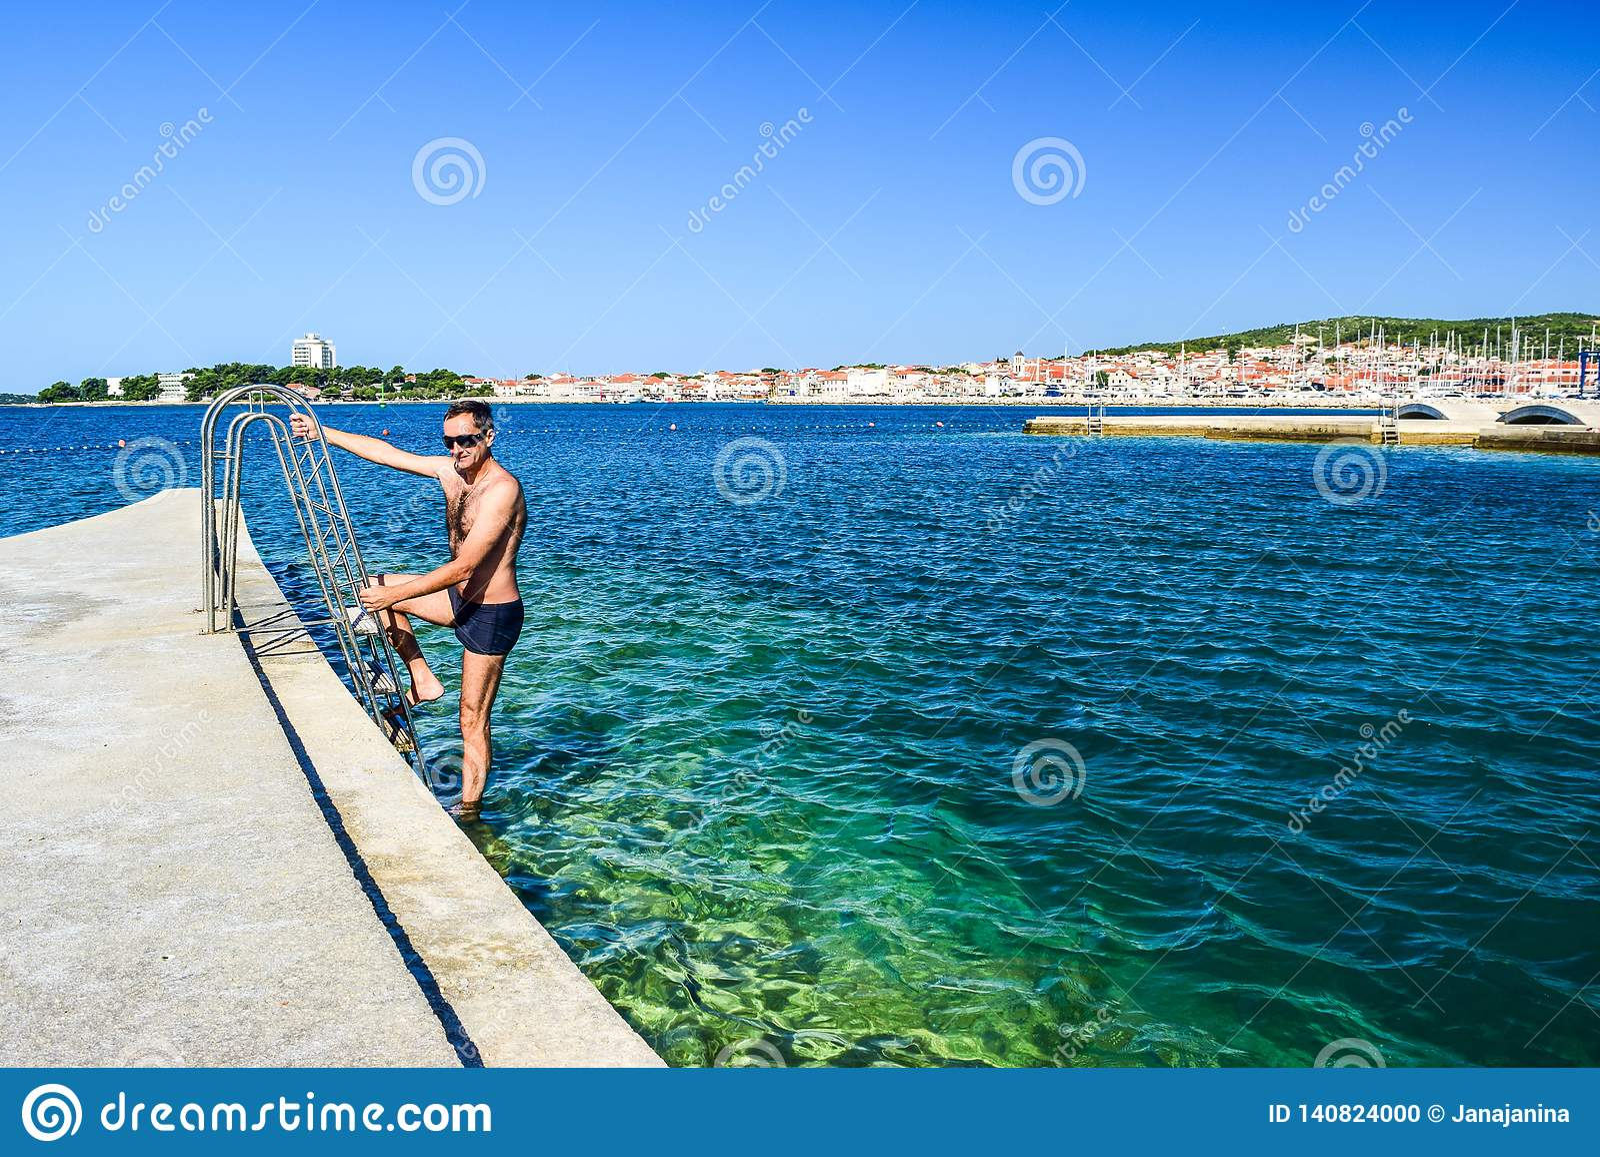 The Vodice beach, Croatia